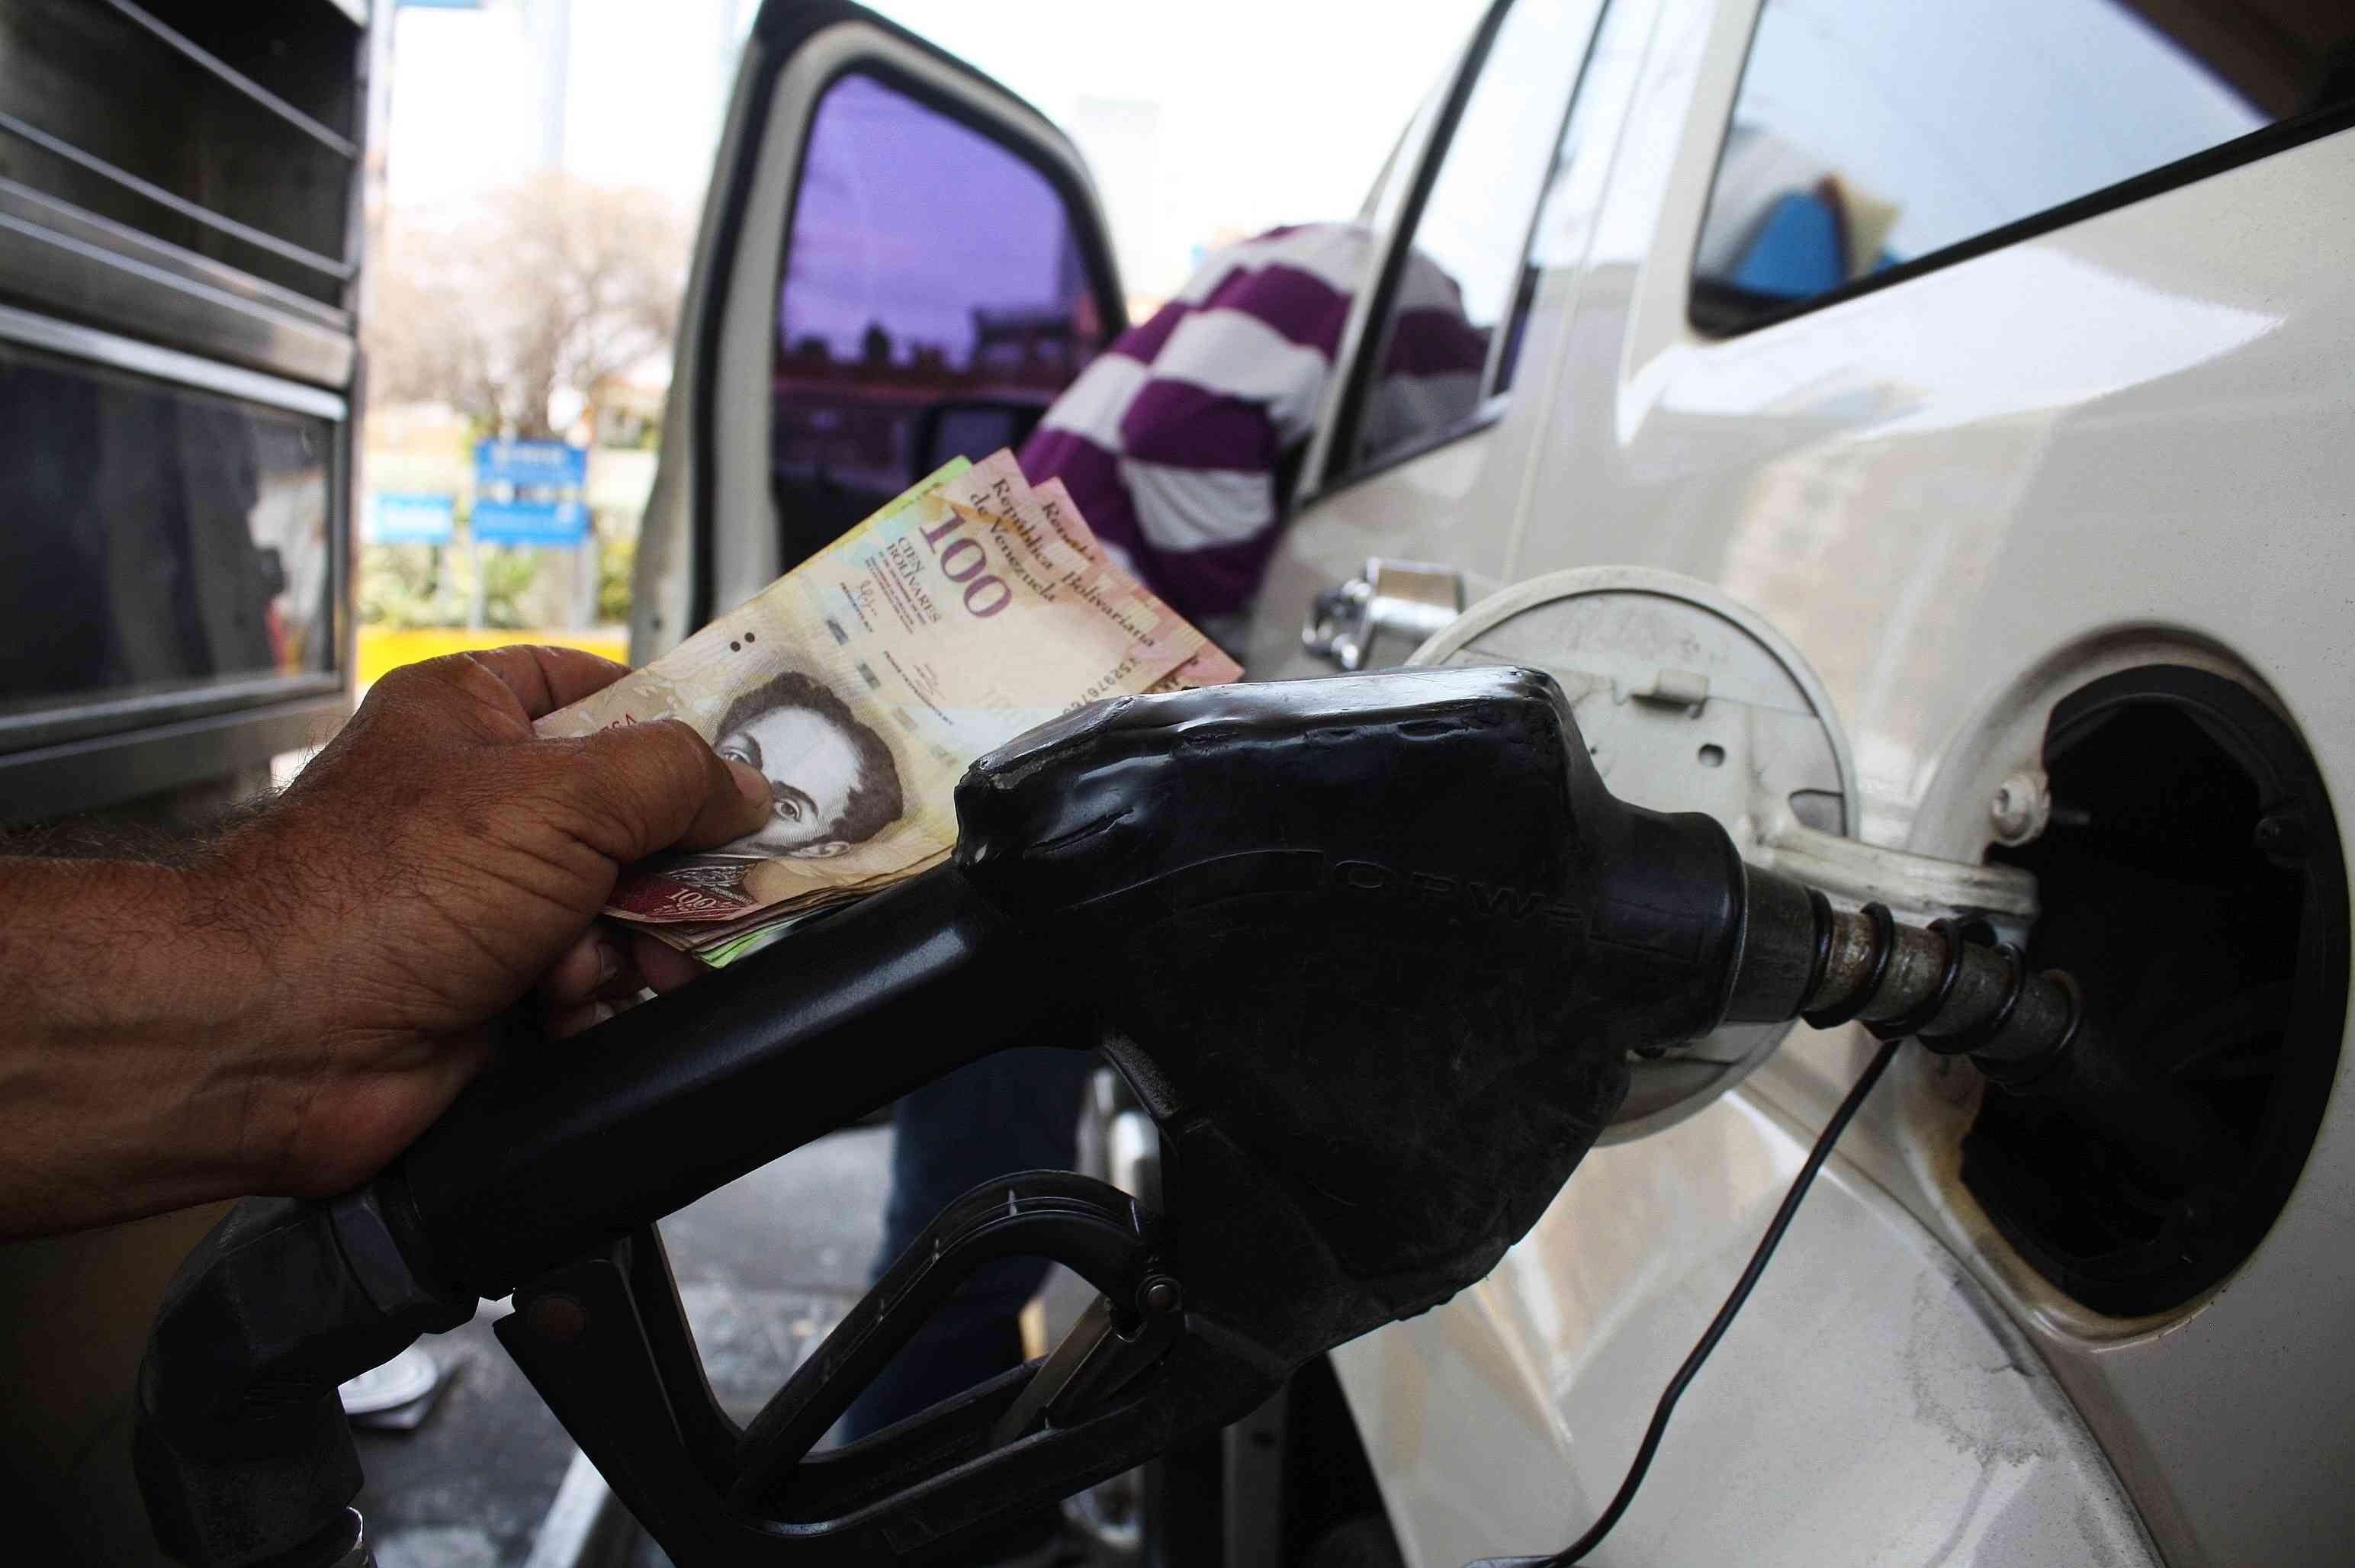 aumenta_gasolina345.jpg_1890500980